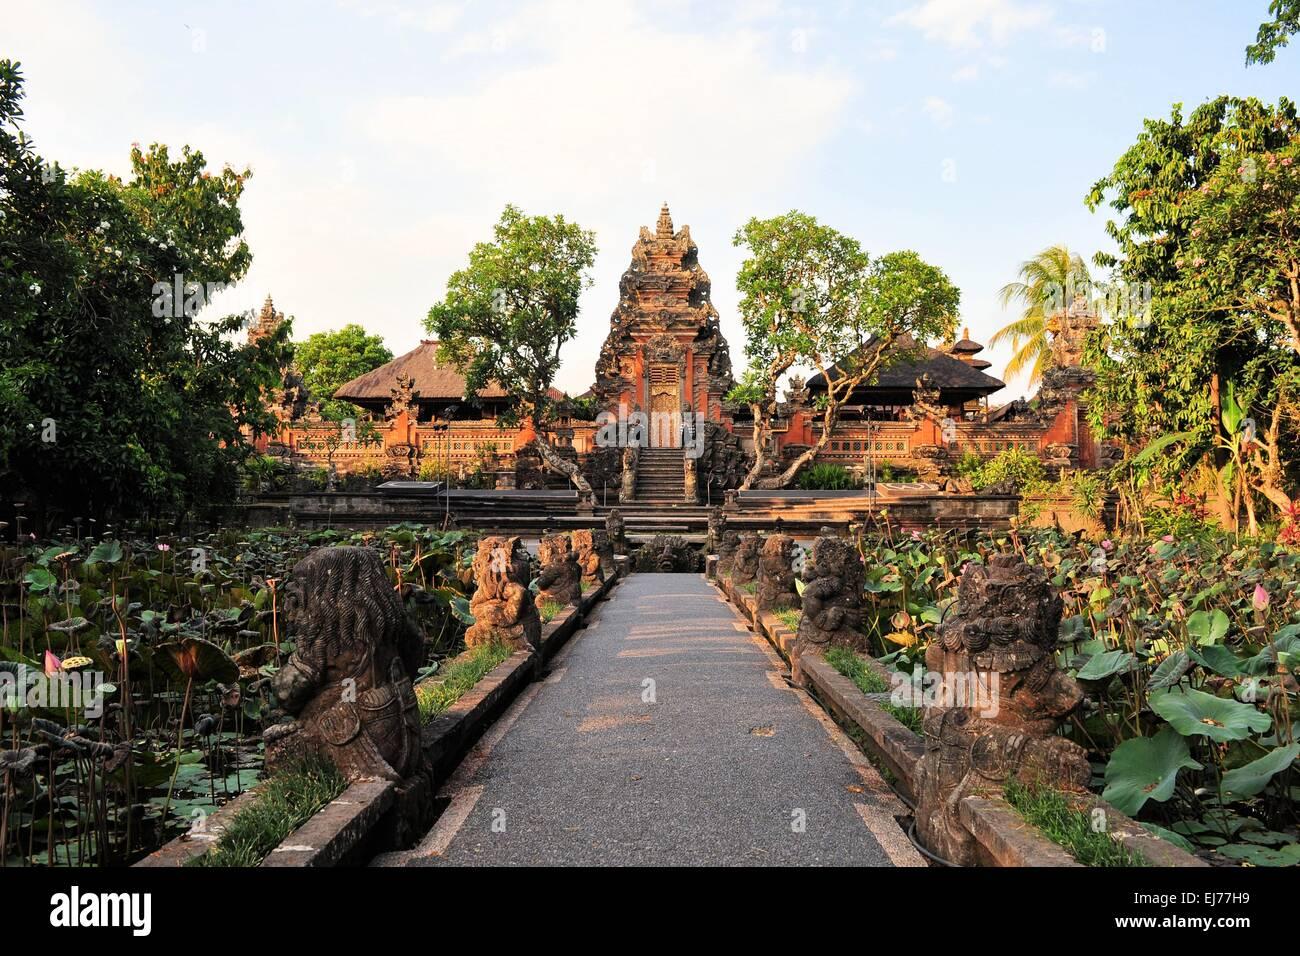 Lotus pond and Hindu temple, Ubud, Bali - Stock Image